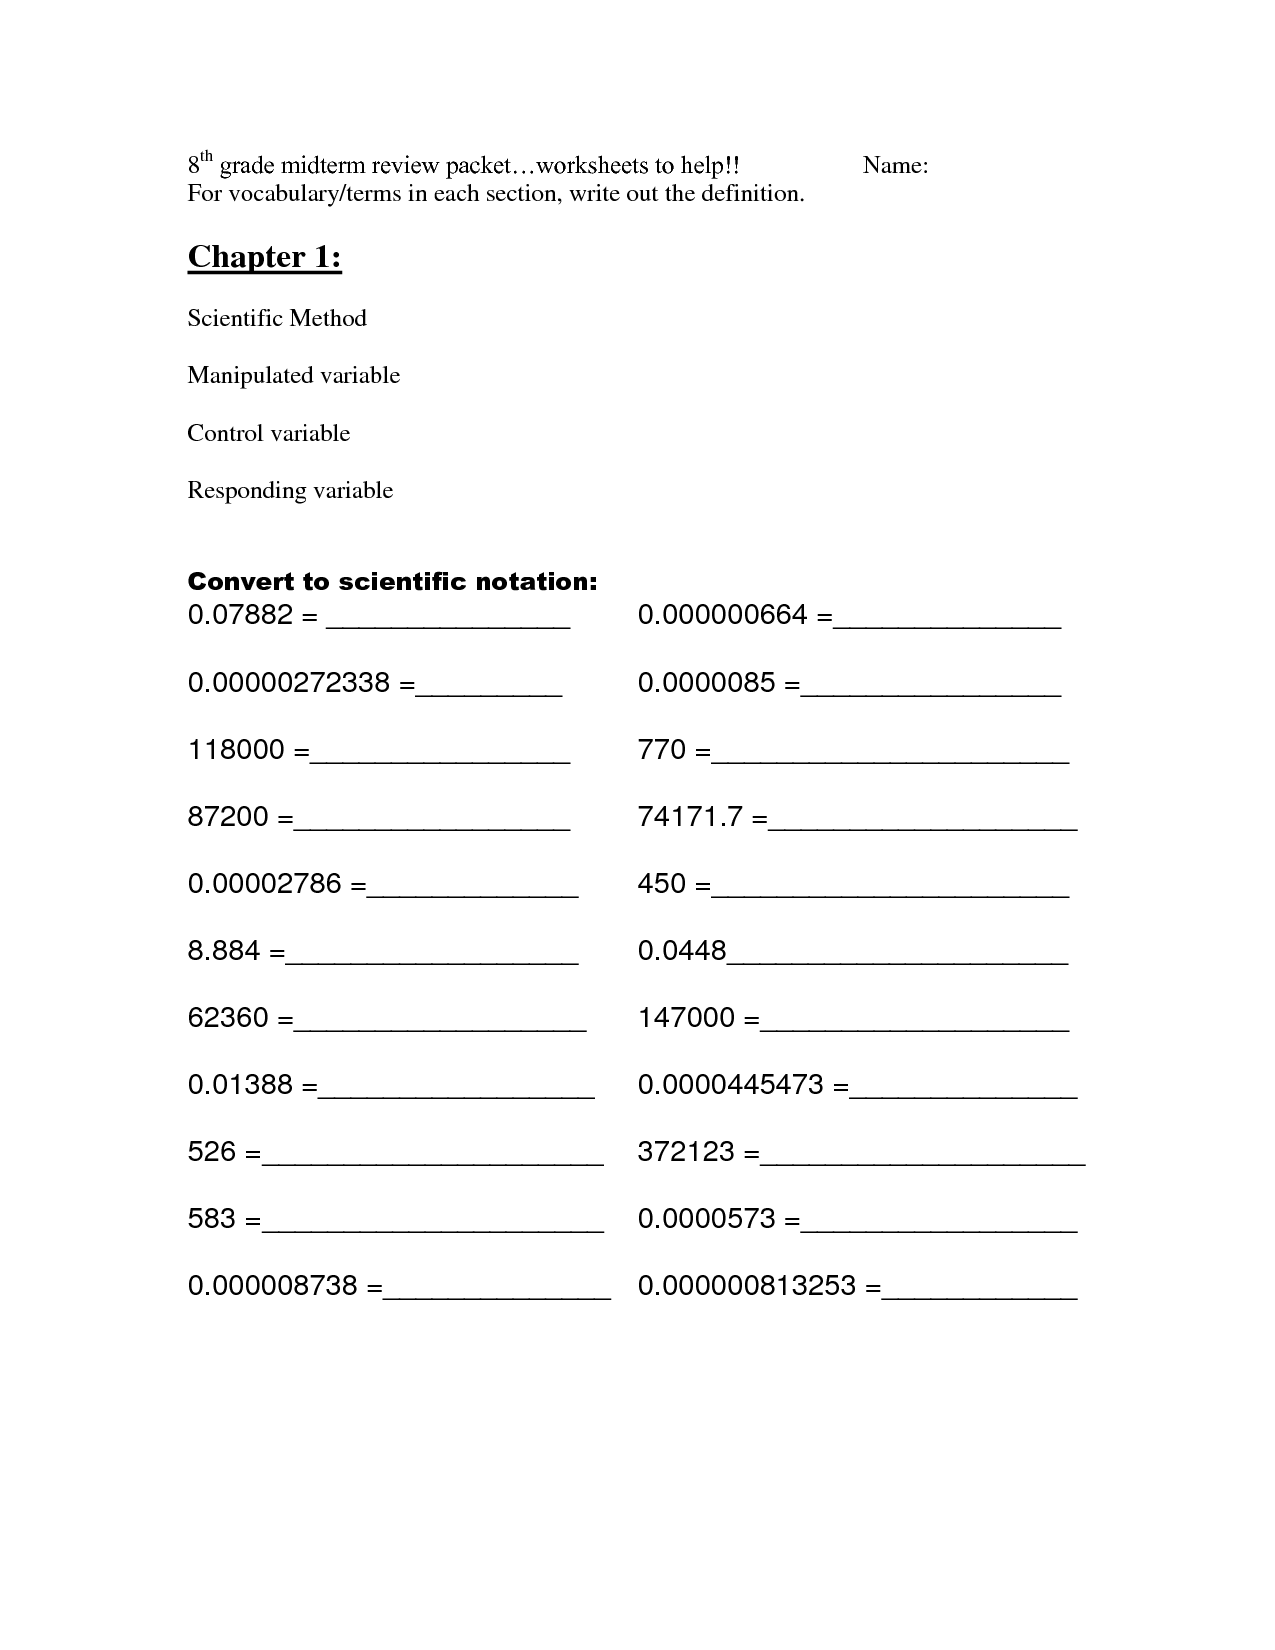 8th Grade Math Review Worksheets